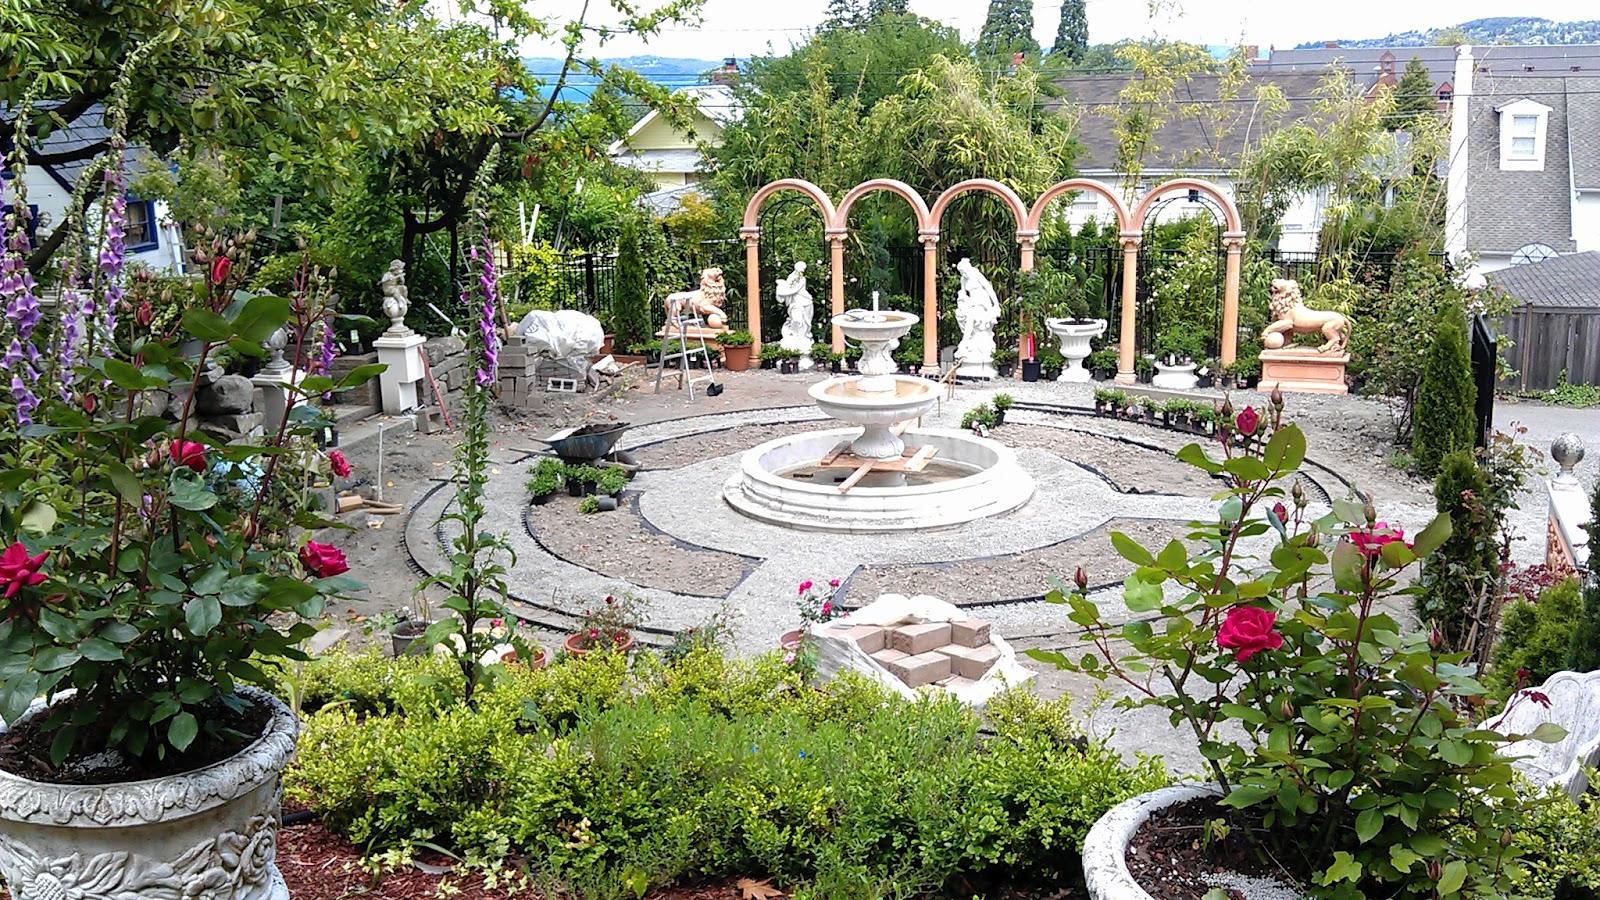 An Italian Garden Under Construction